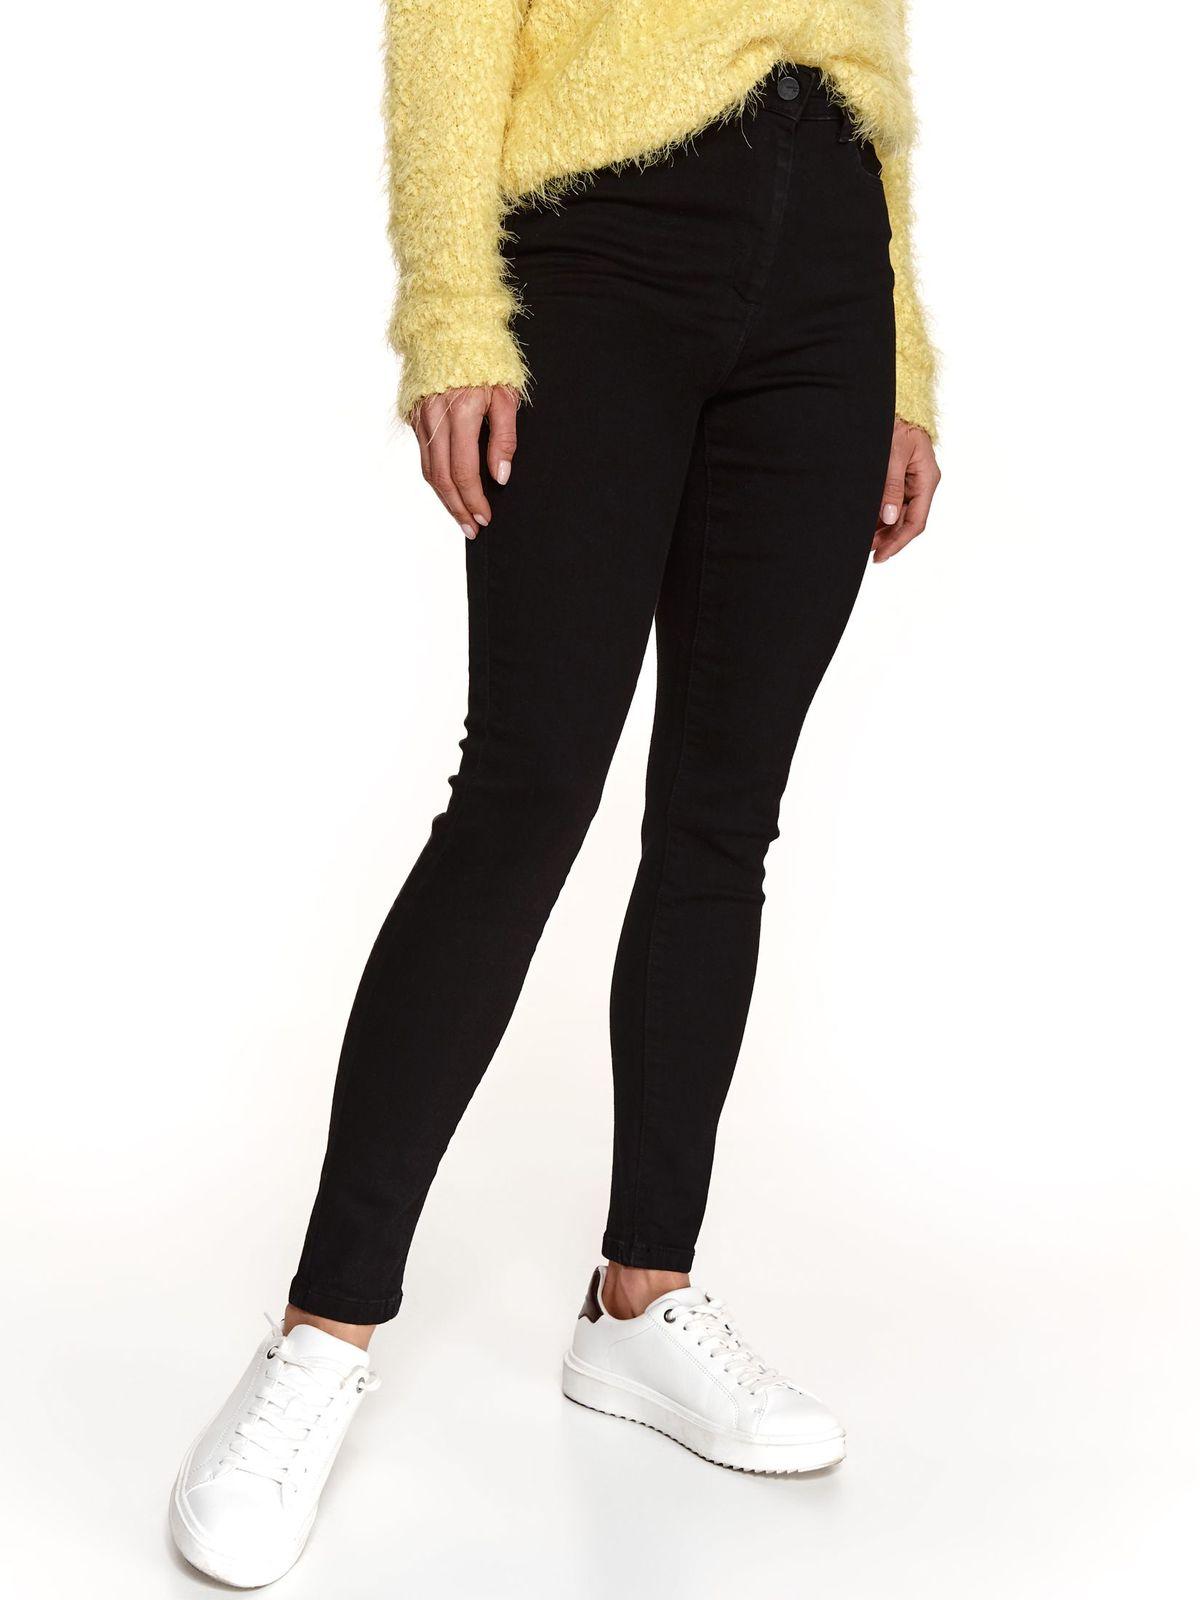 Denim slightly elastic cotton high waisted black trousers